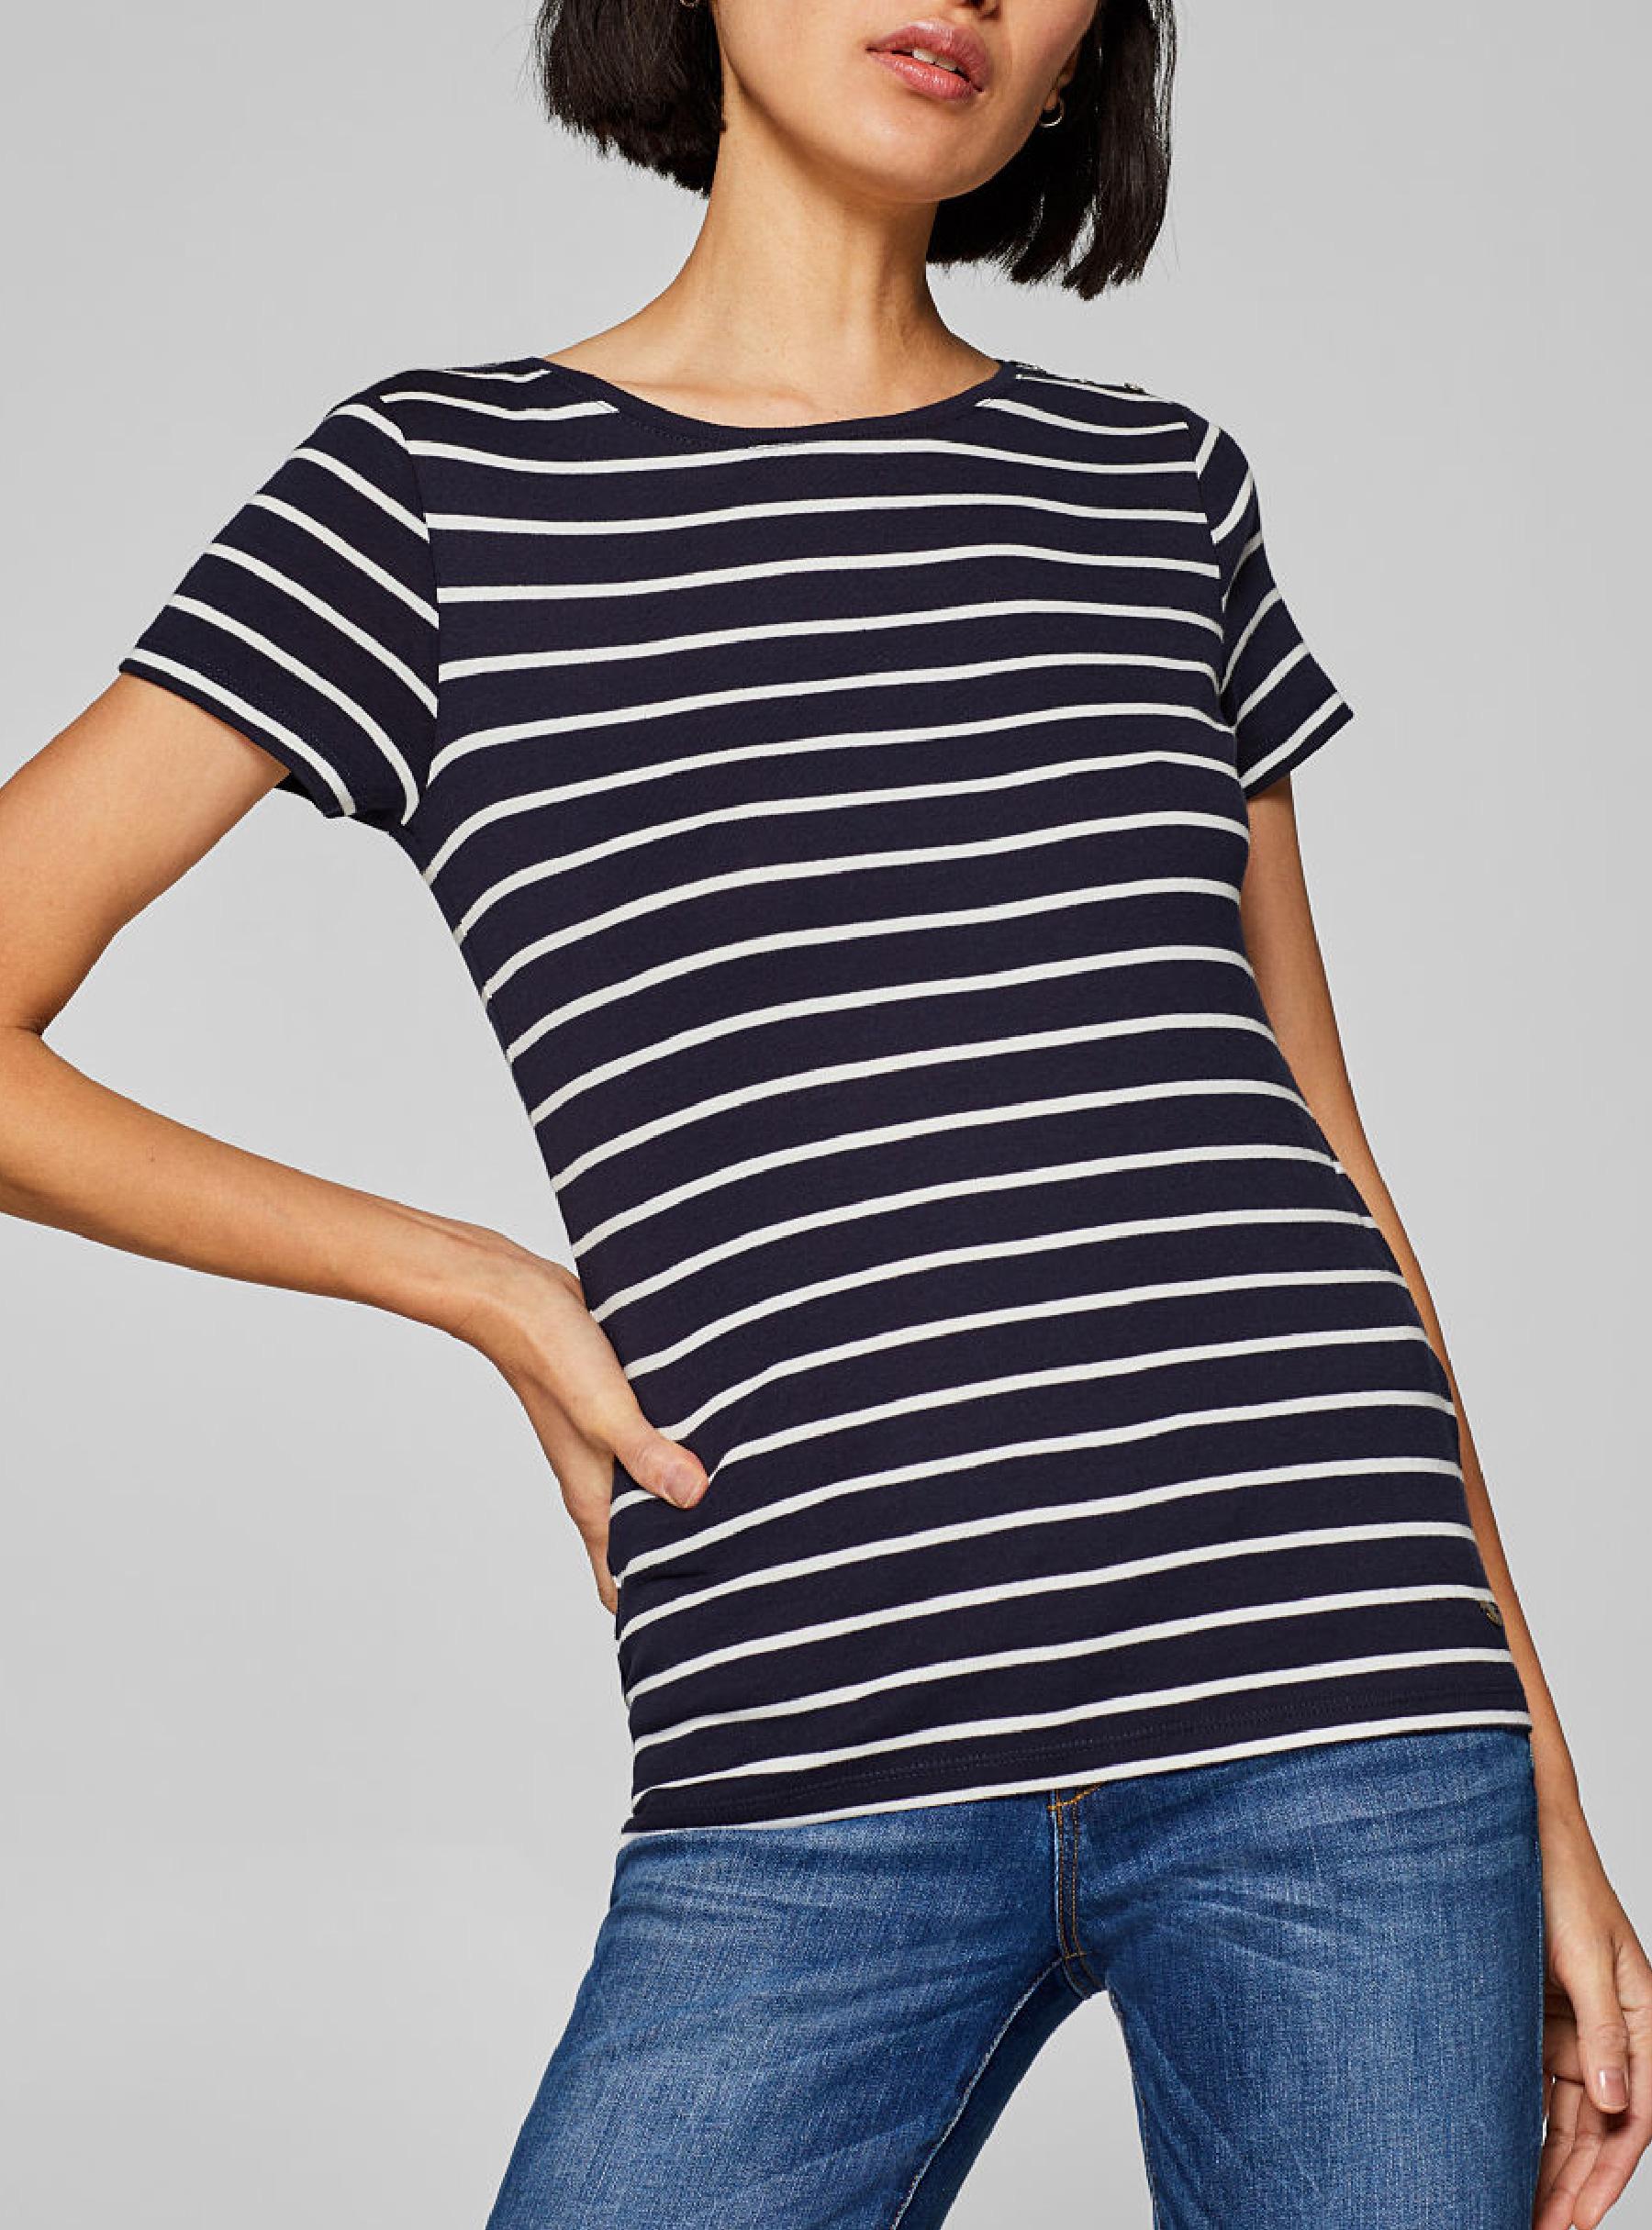 Cena Esprit majice: 2.699 rsd